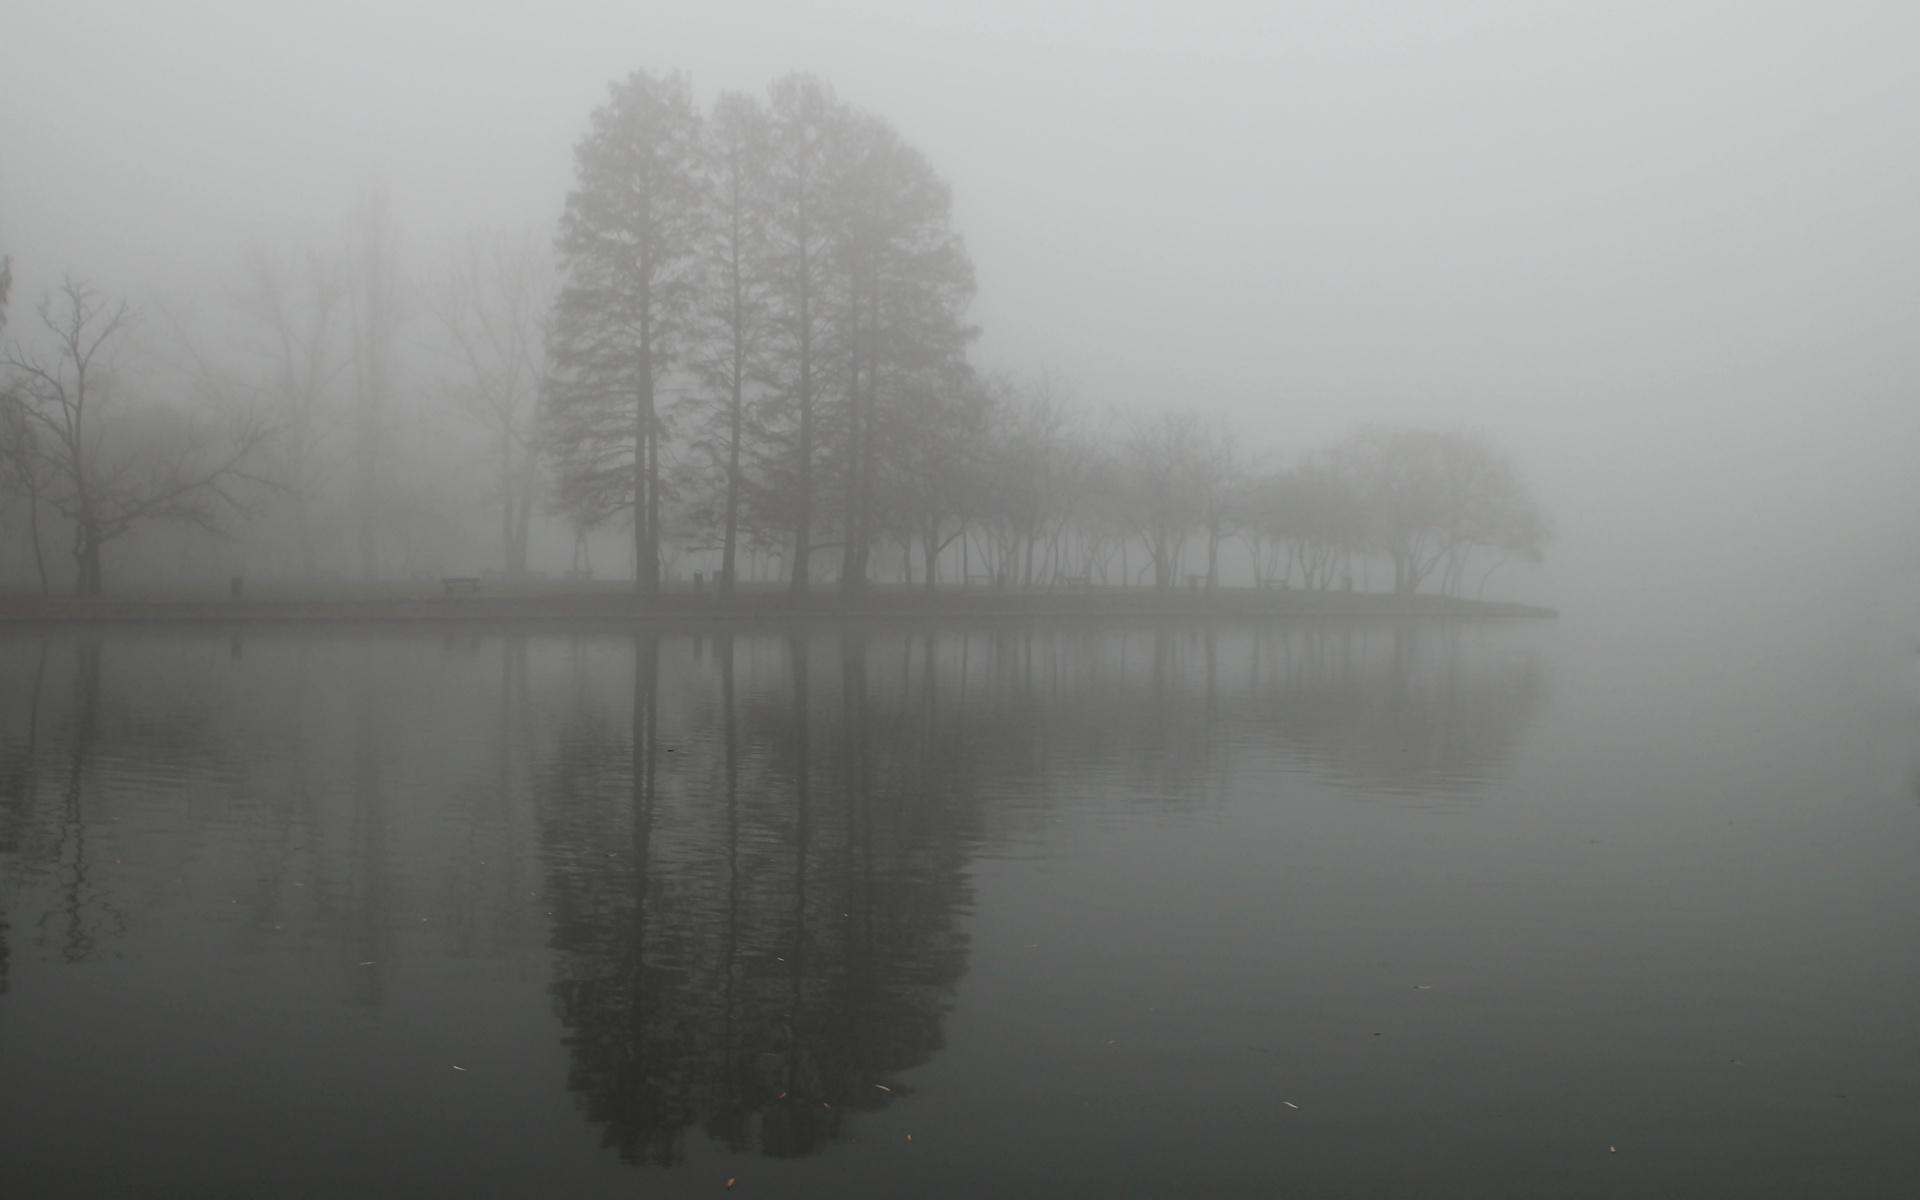 Mist clipart black and white #7